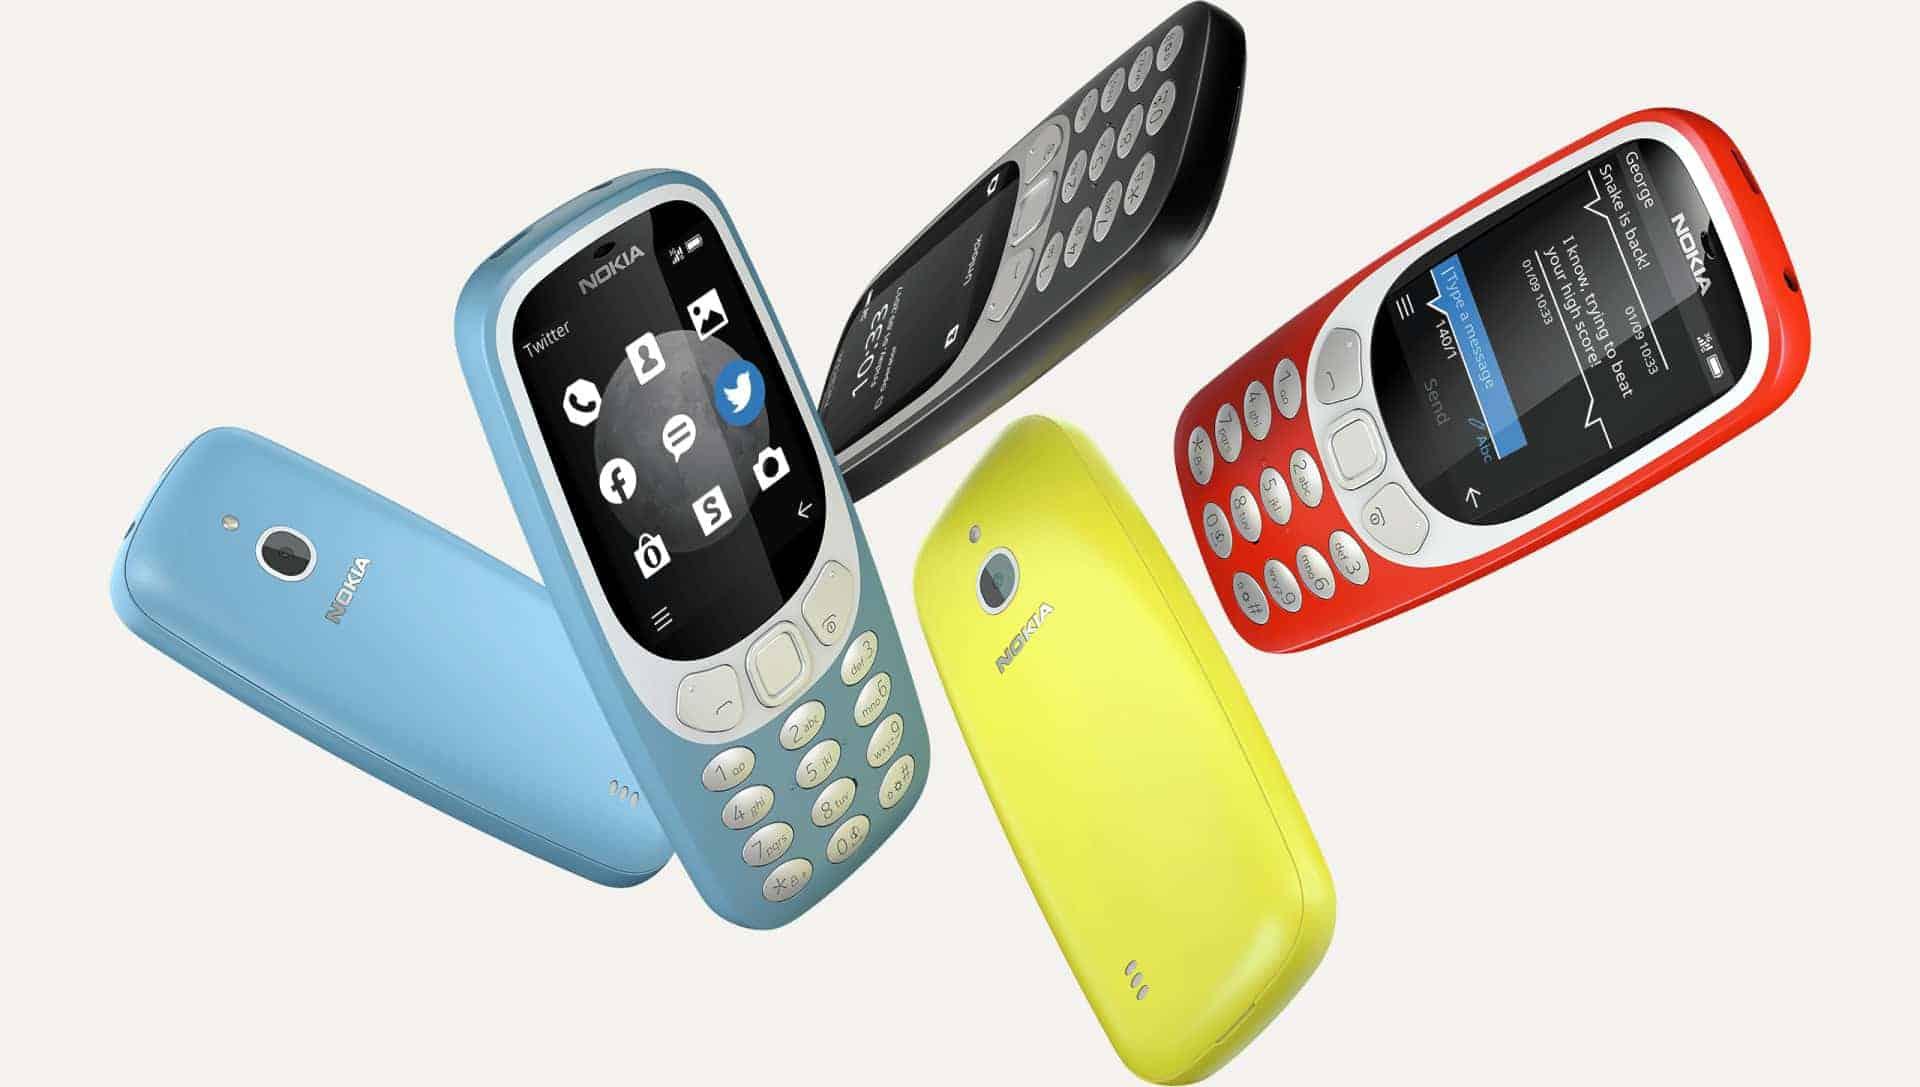 Nokia 3310 2017 3G connectivity 1